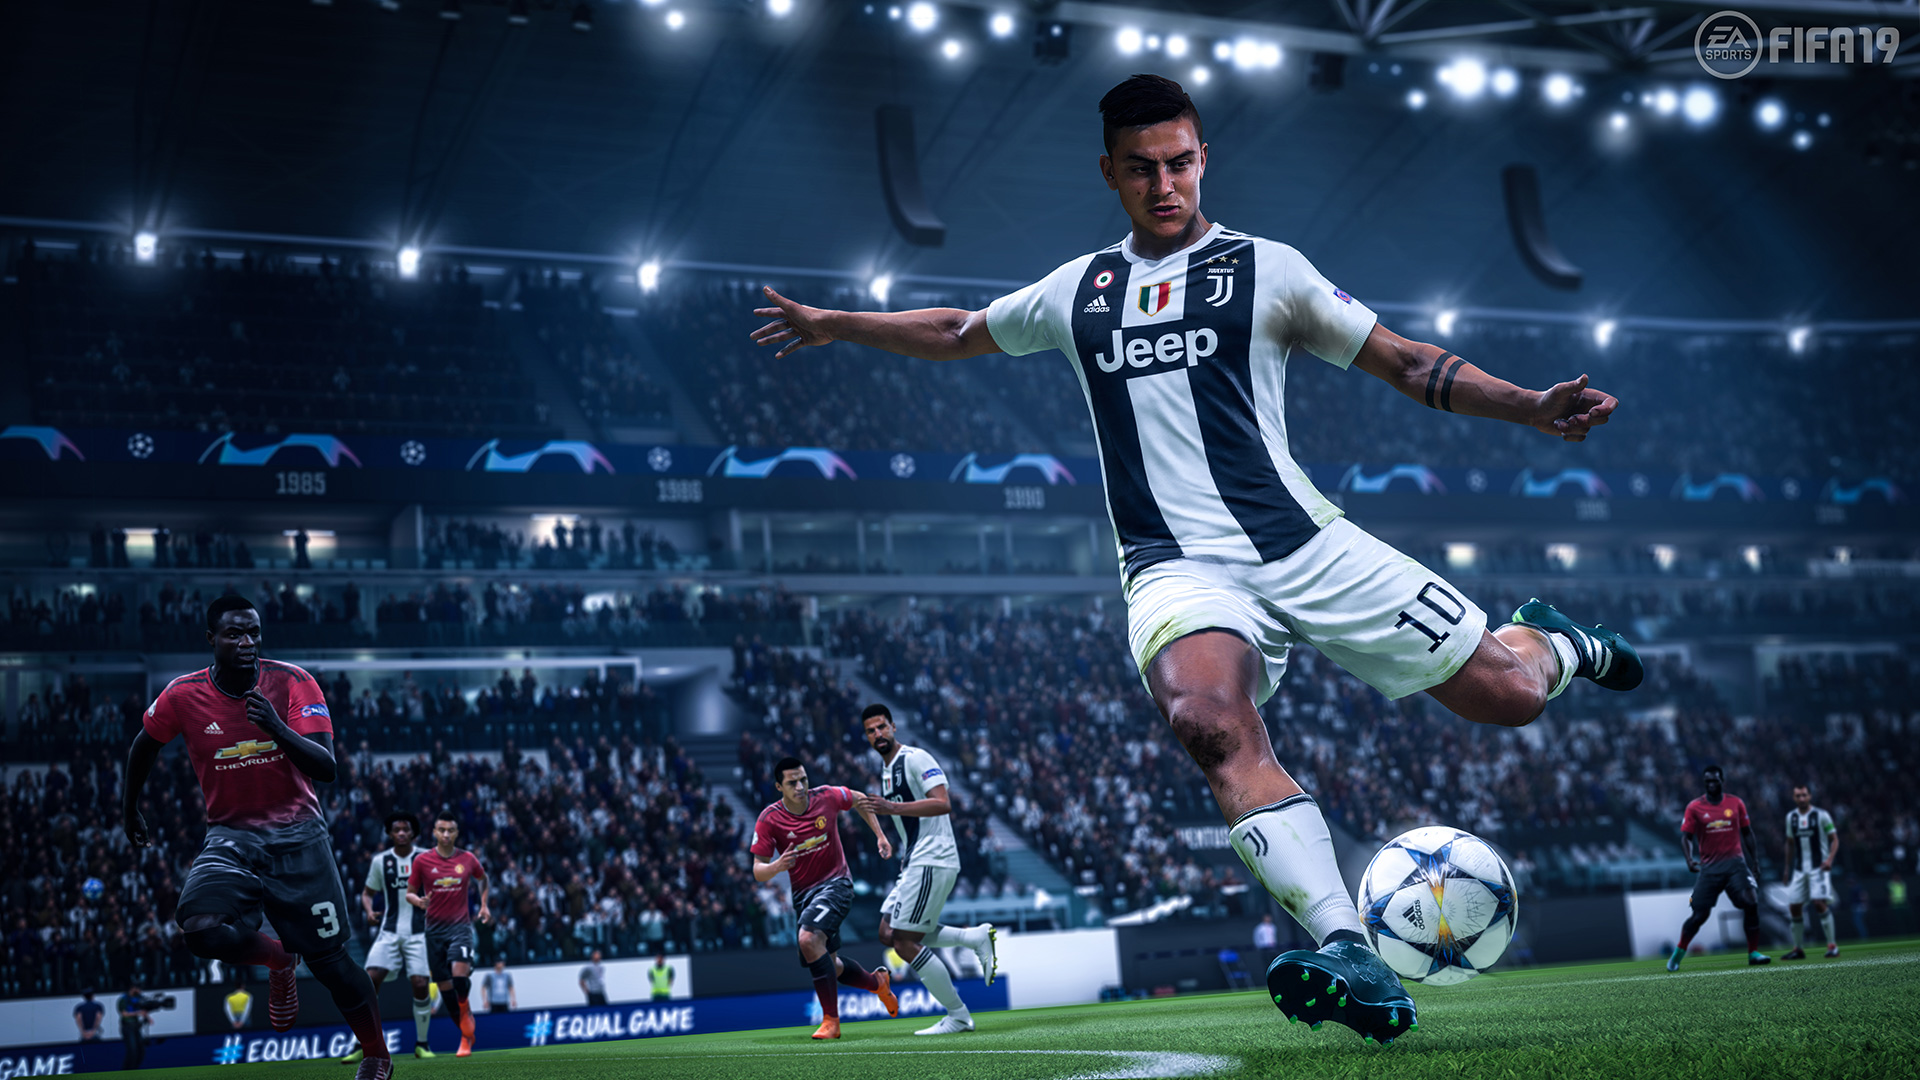 FIFA 19 - Timed Finishing